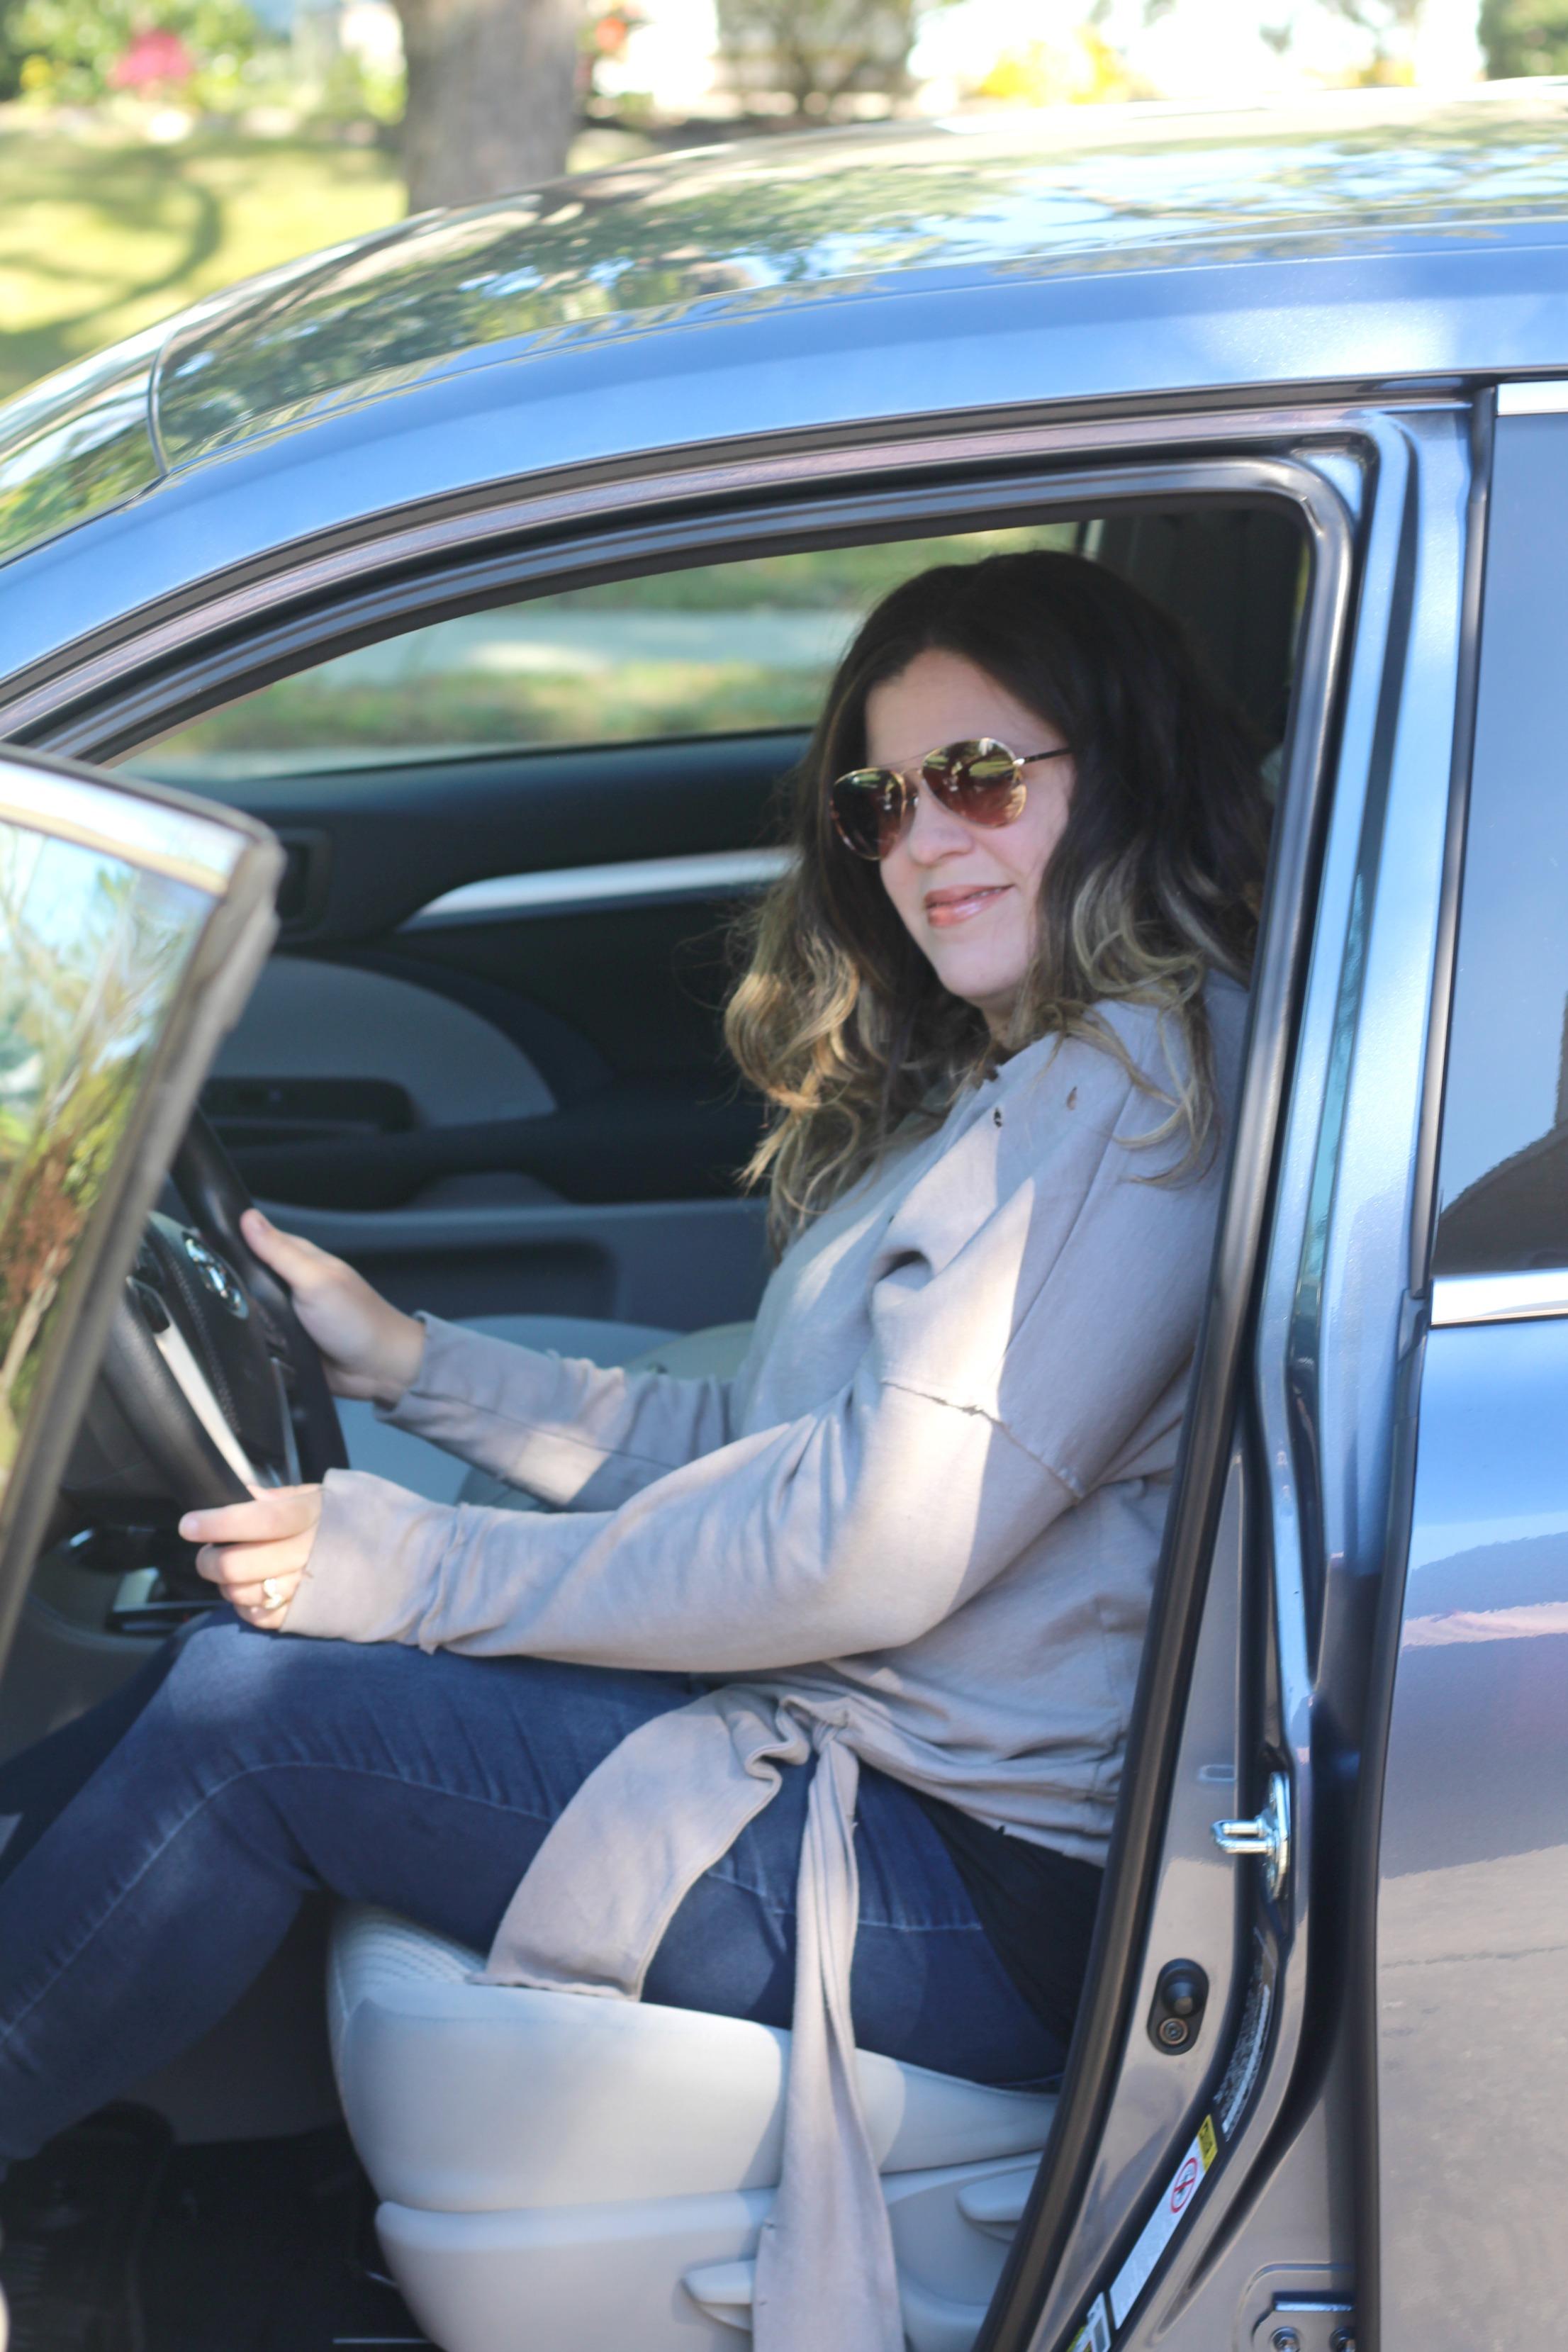 Road Trip Diaries - Hershey/Harrisburg in the 2017 Toyota Highlander